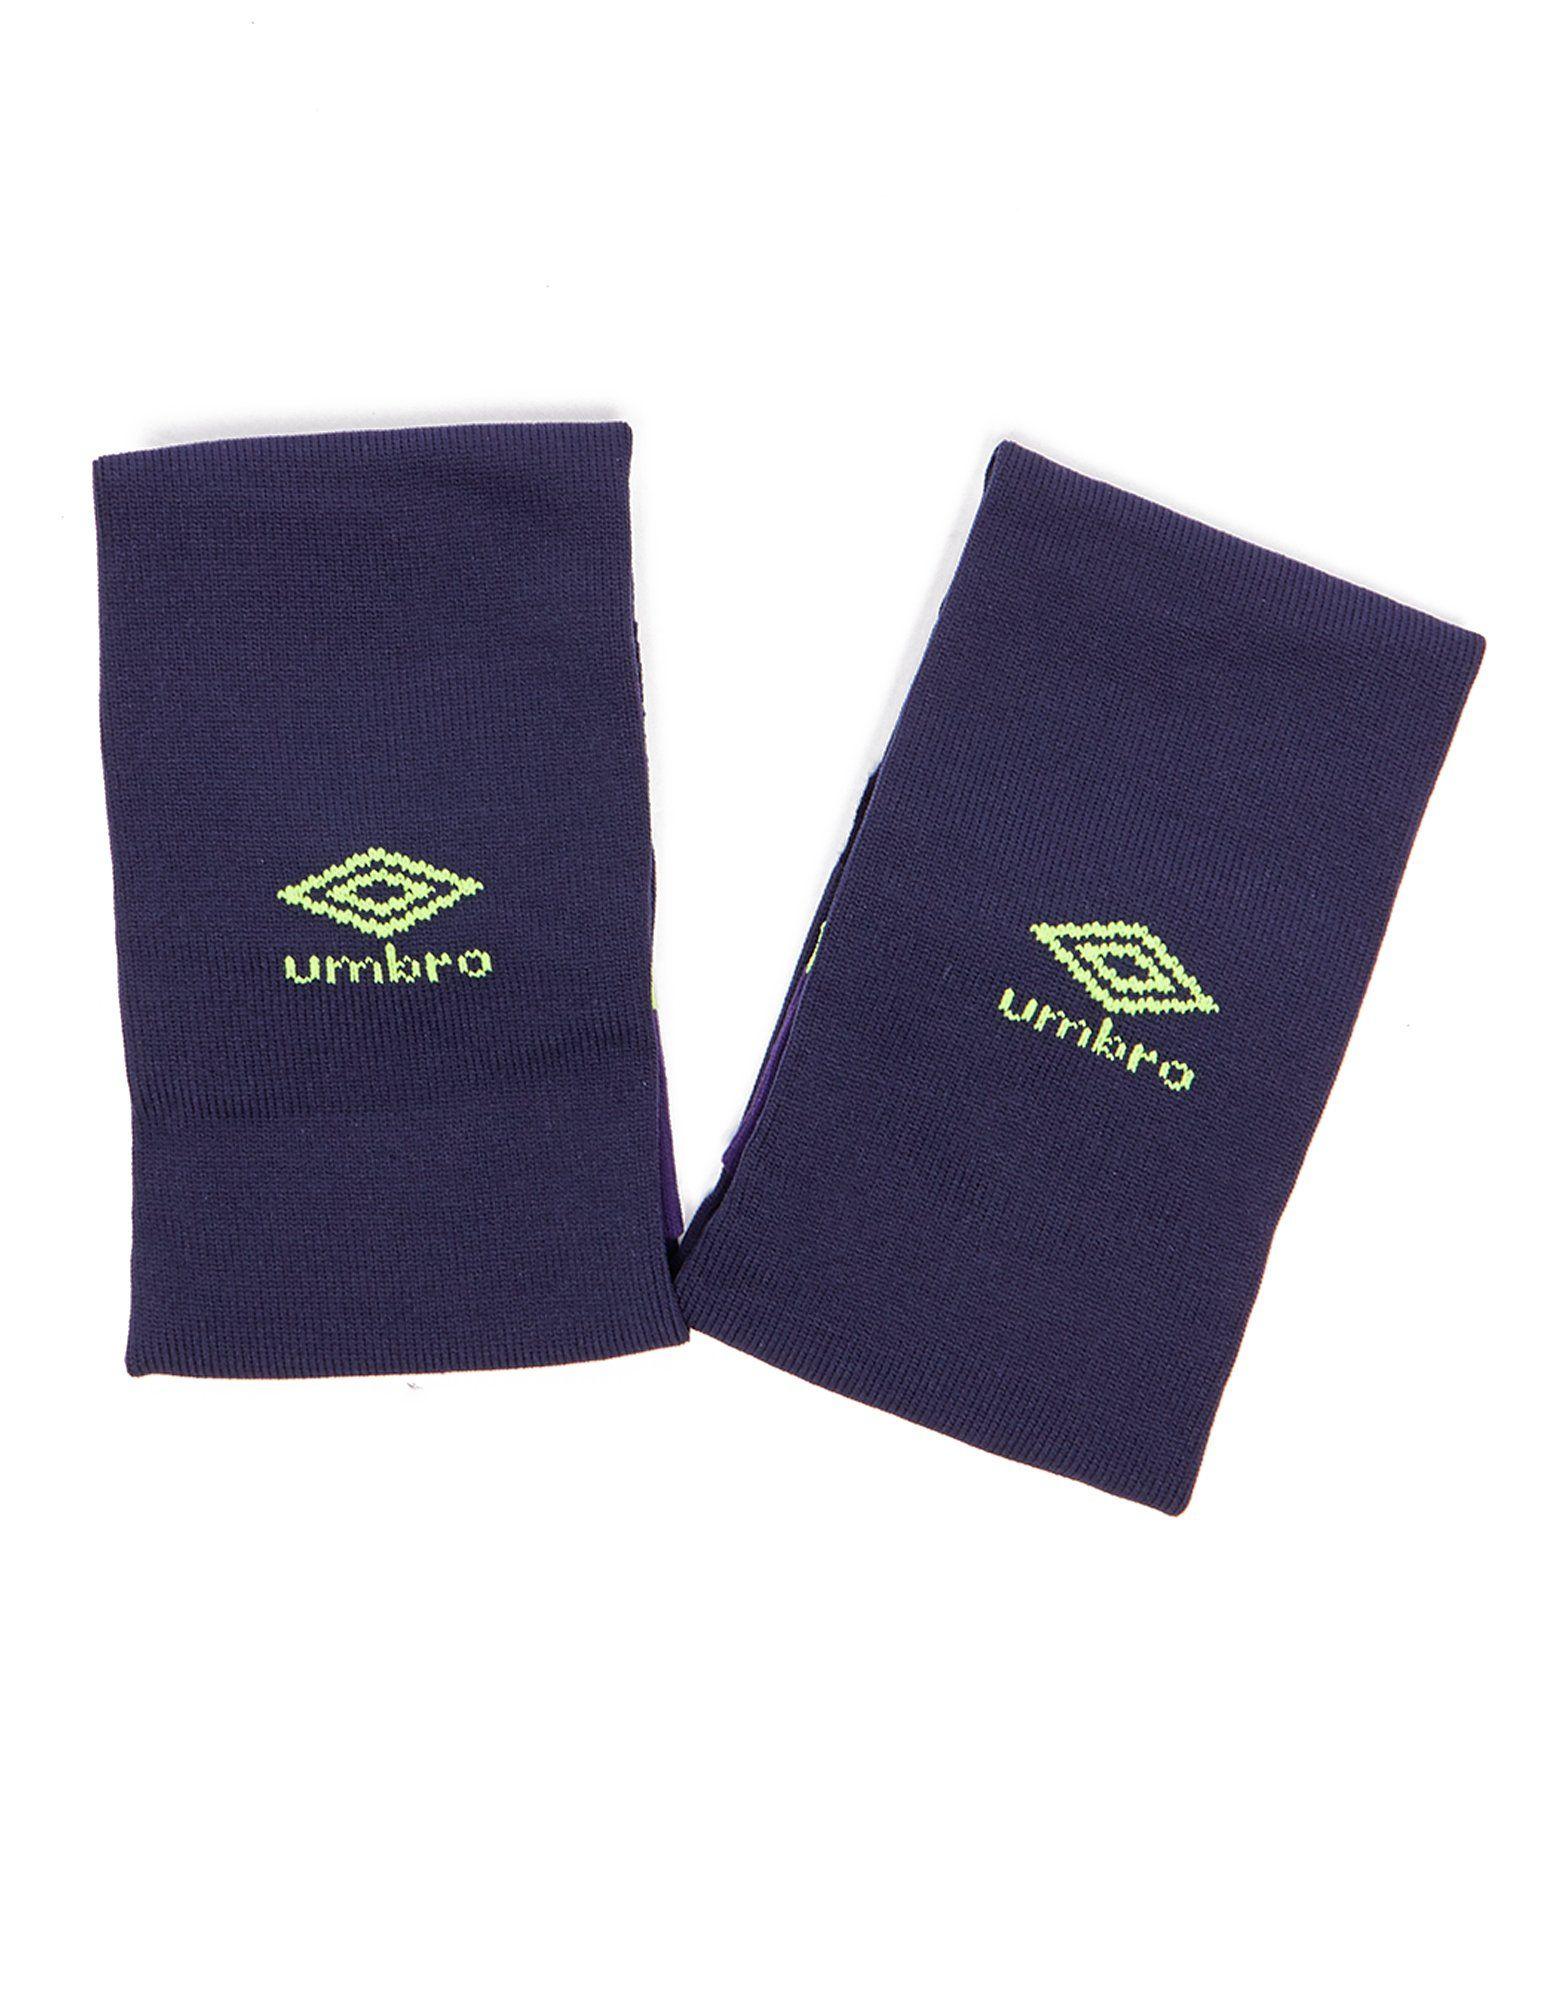 Umbro Everton FC 2017/18 Third Socks